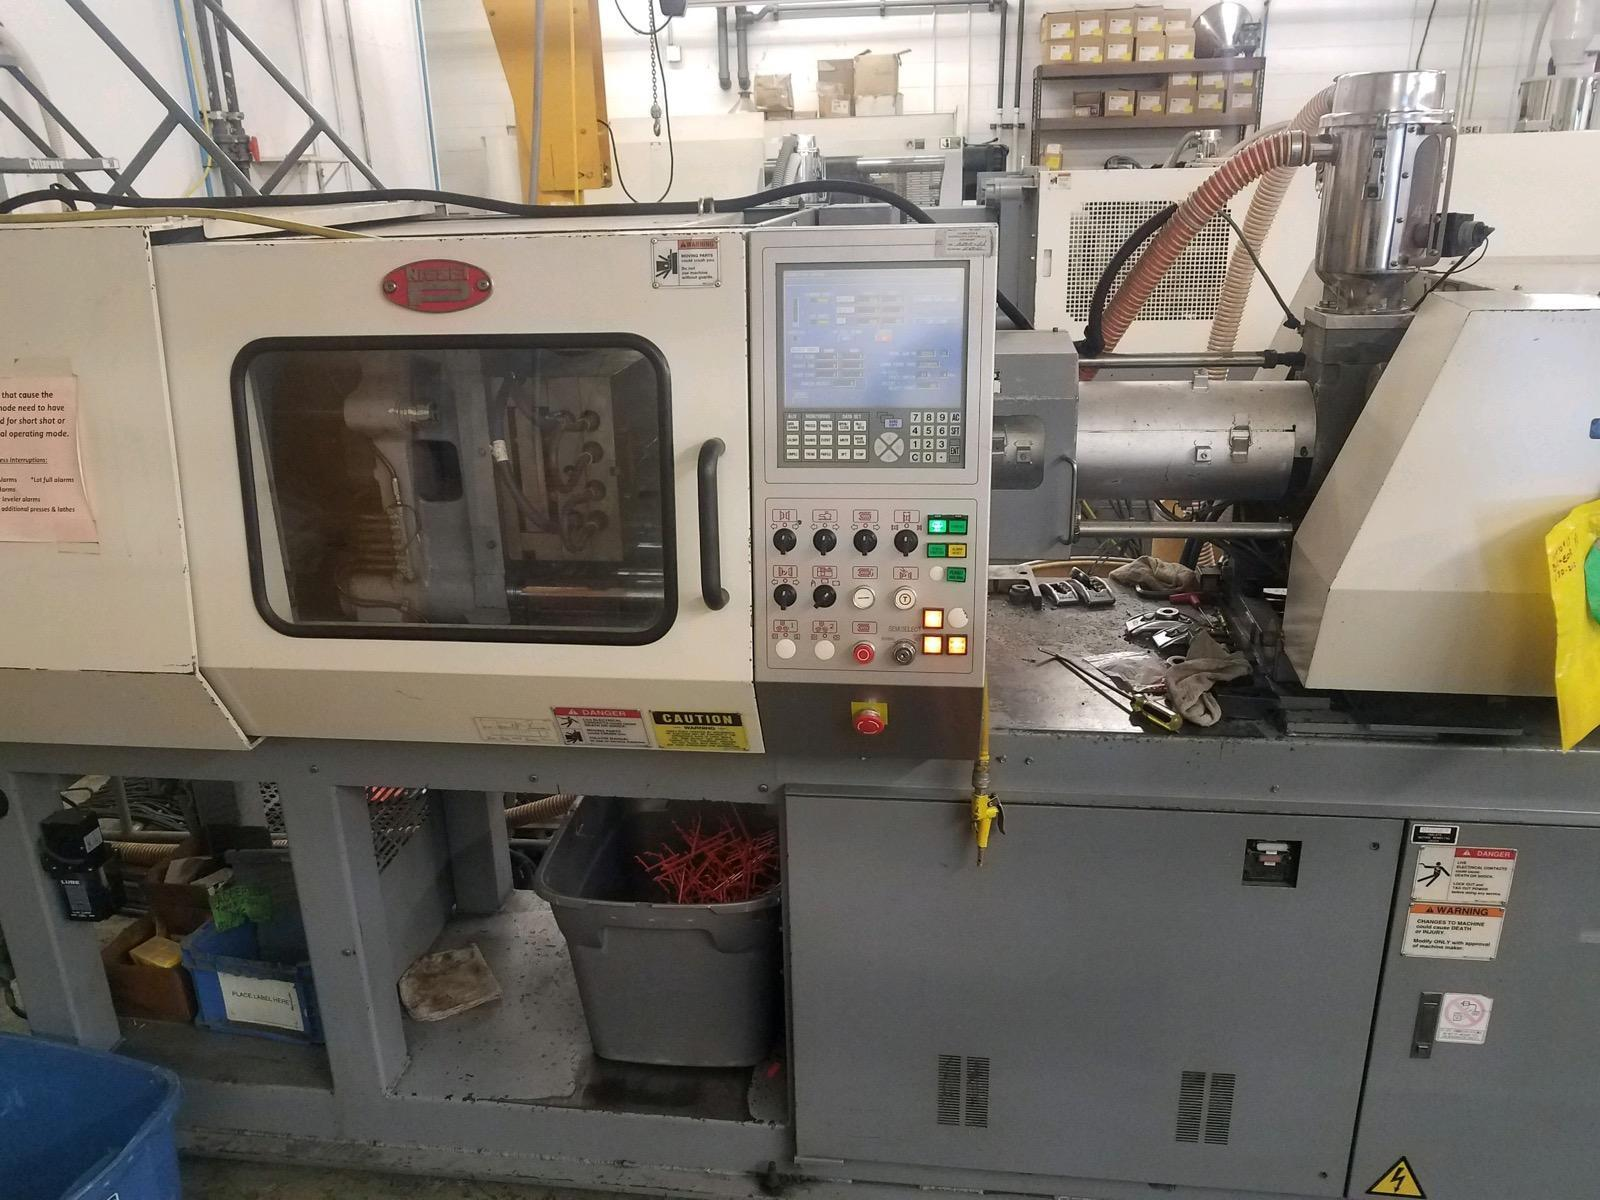 Nissei ES600-9E Used Injection Molding Machine, 66 US ton, 2.9 oz. yr 2003